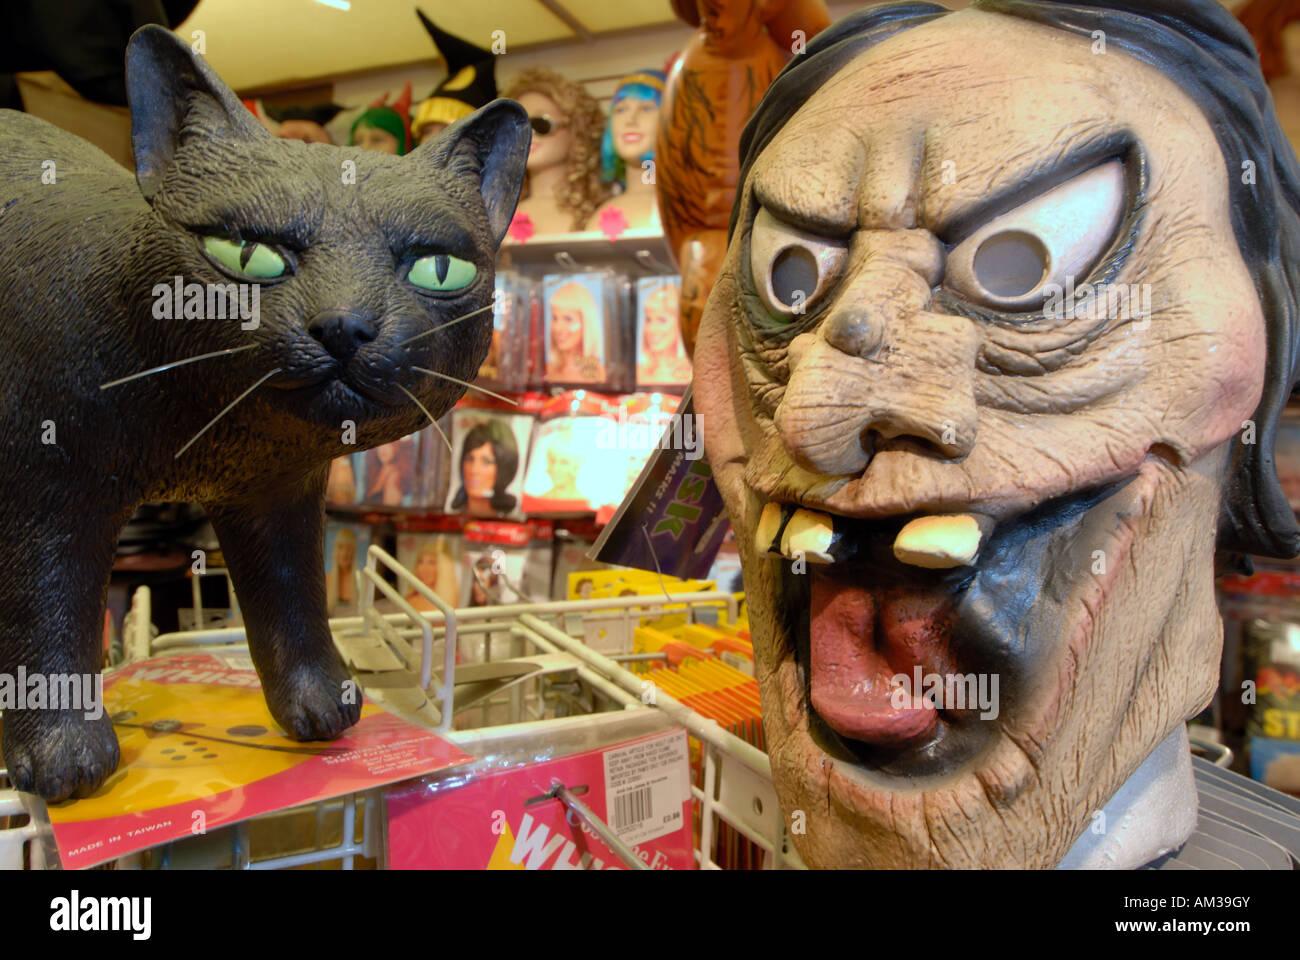 mask and a cat halloween party items at aha ha ha jokes & novelties shop in Edinburgh Scotland - Stock Image